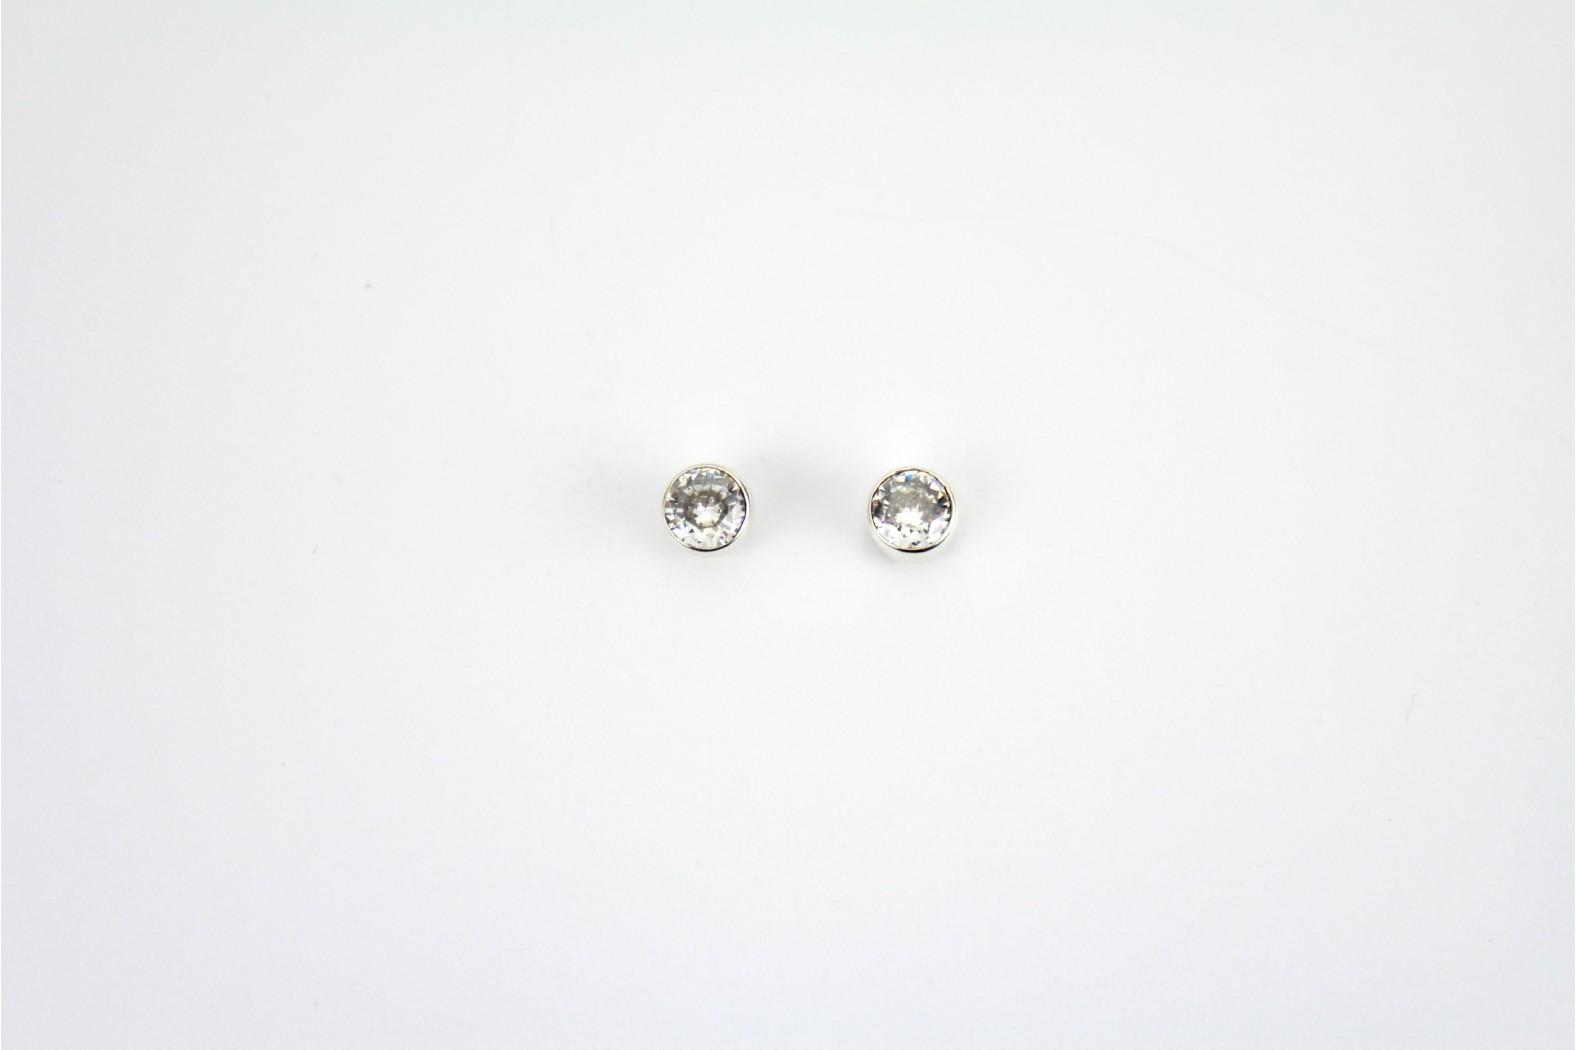 Circular Clear Crystal stud earrings set in circular silver mounting